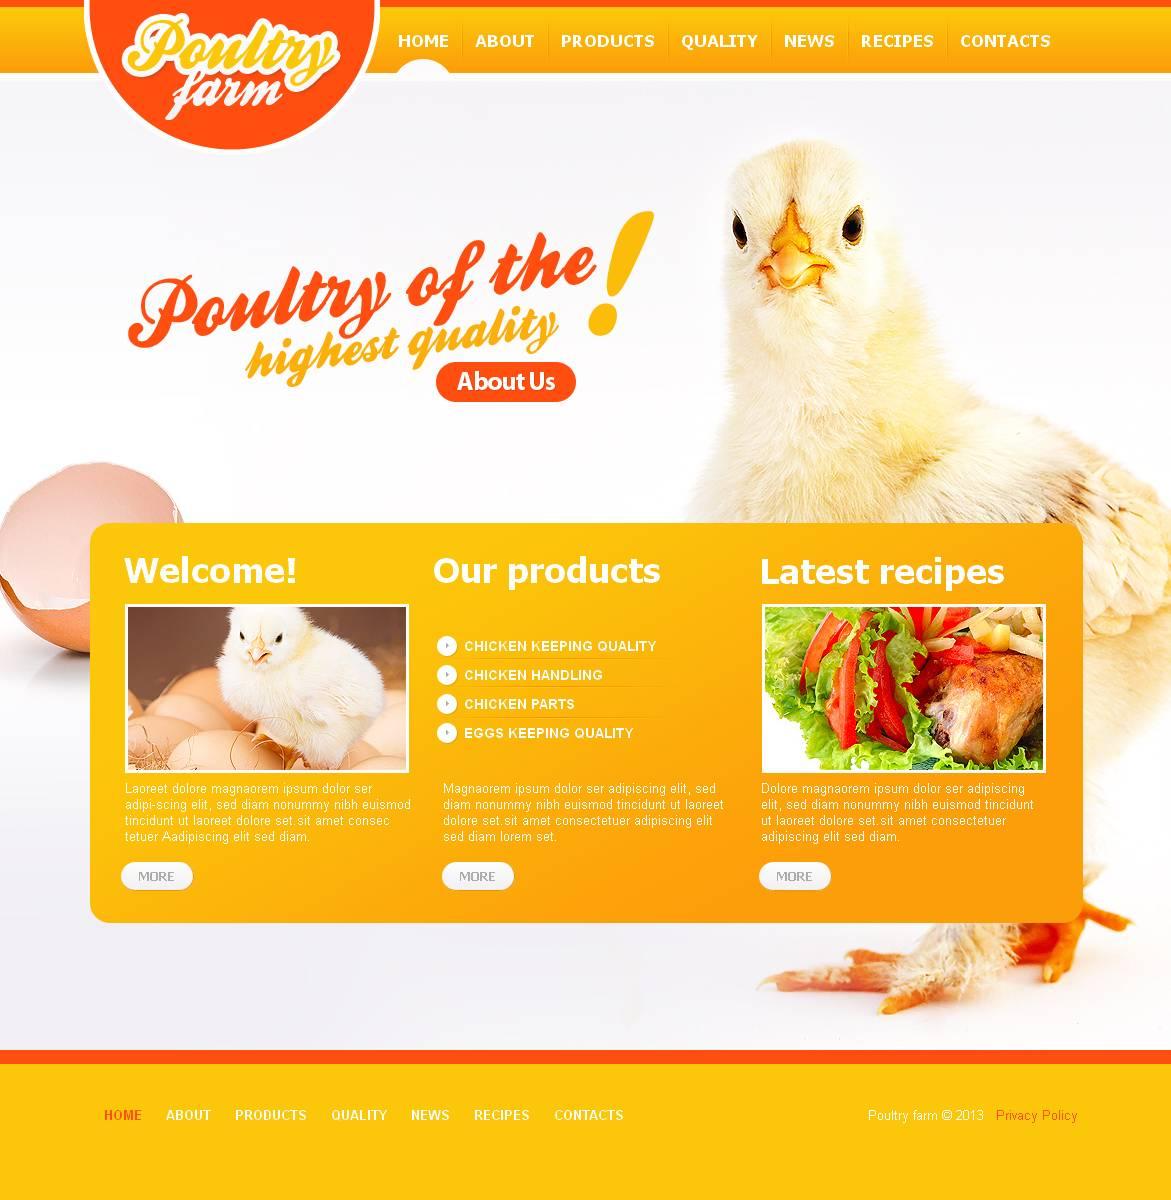 Poultry Farm Moto CMS HTML Template #45113